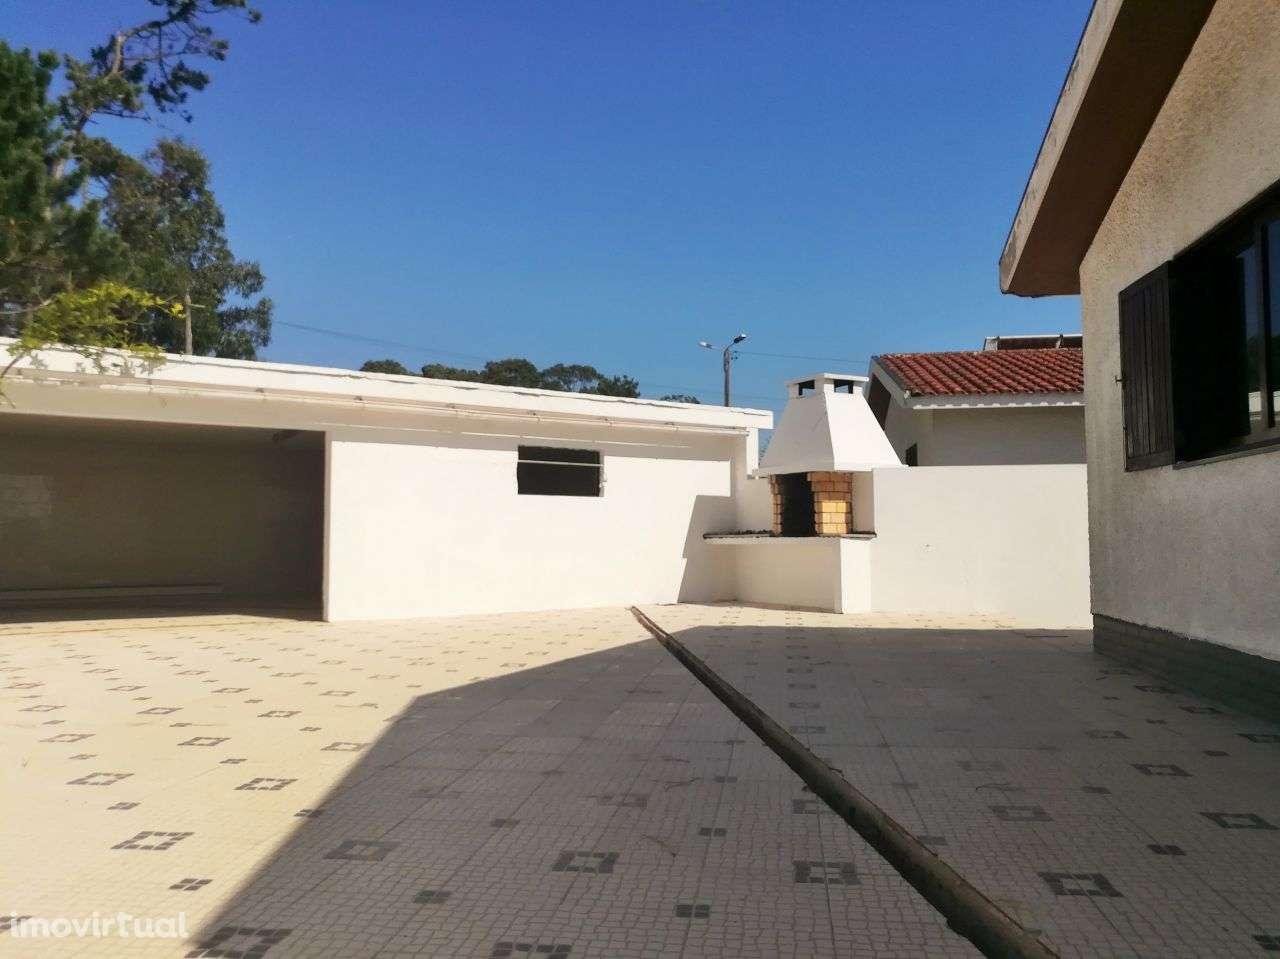 Moradia para comprar, Vila do Conde - Foto 10